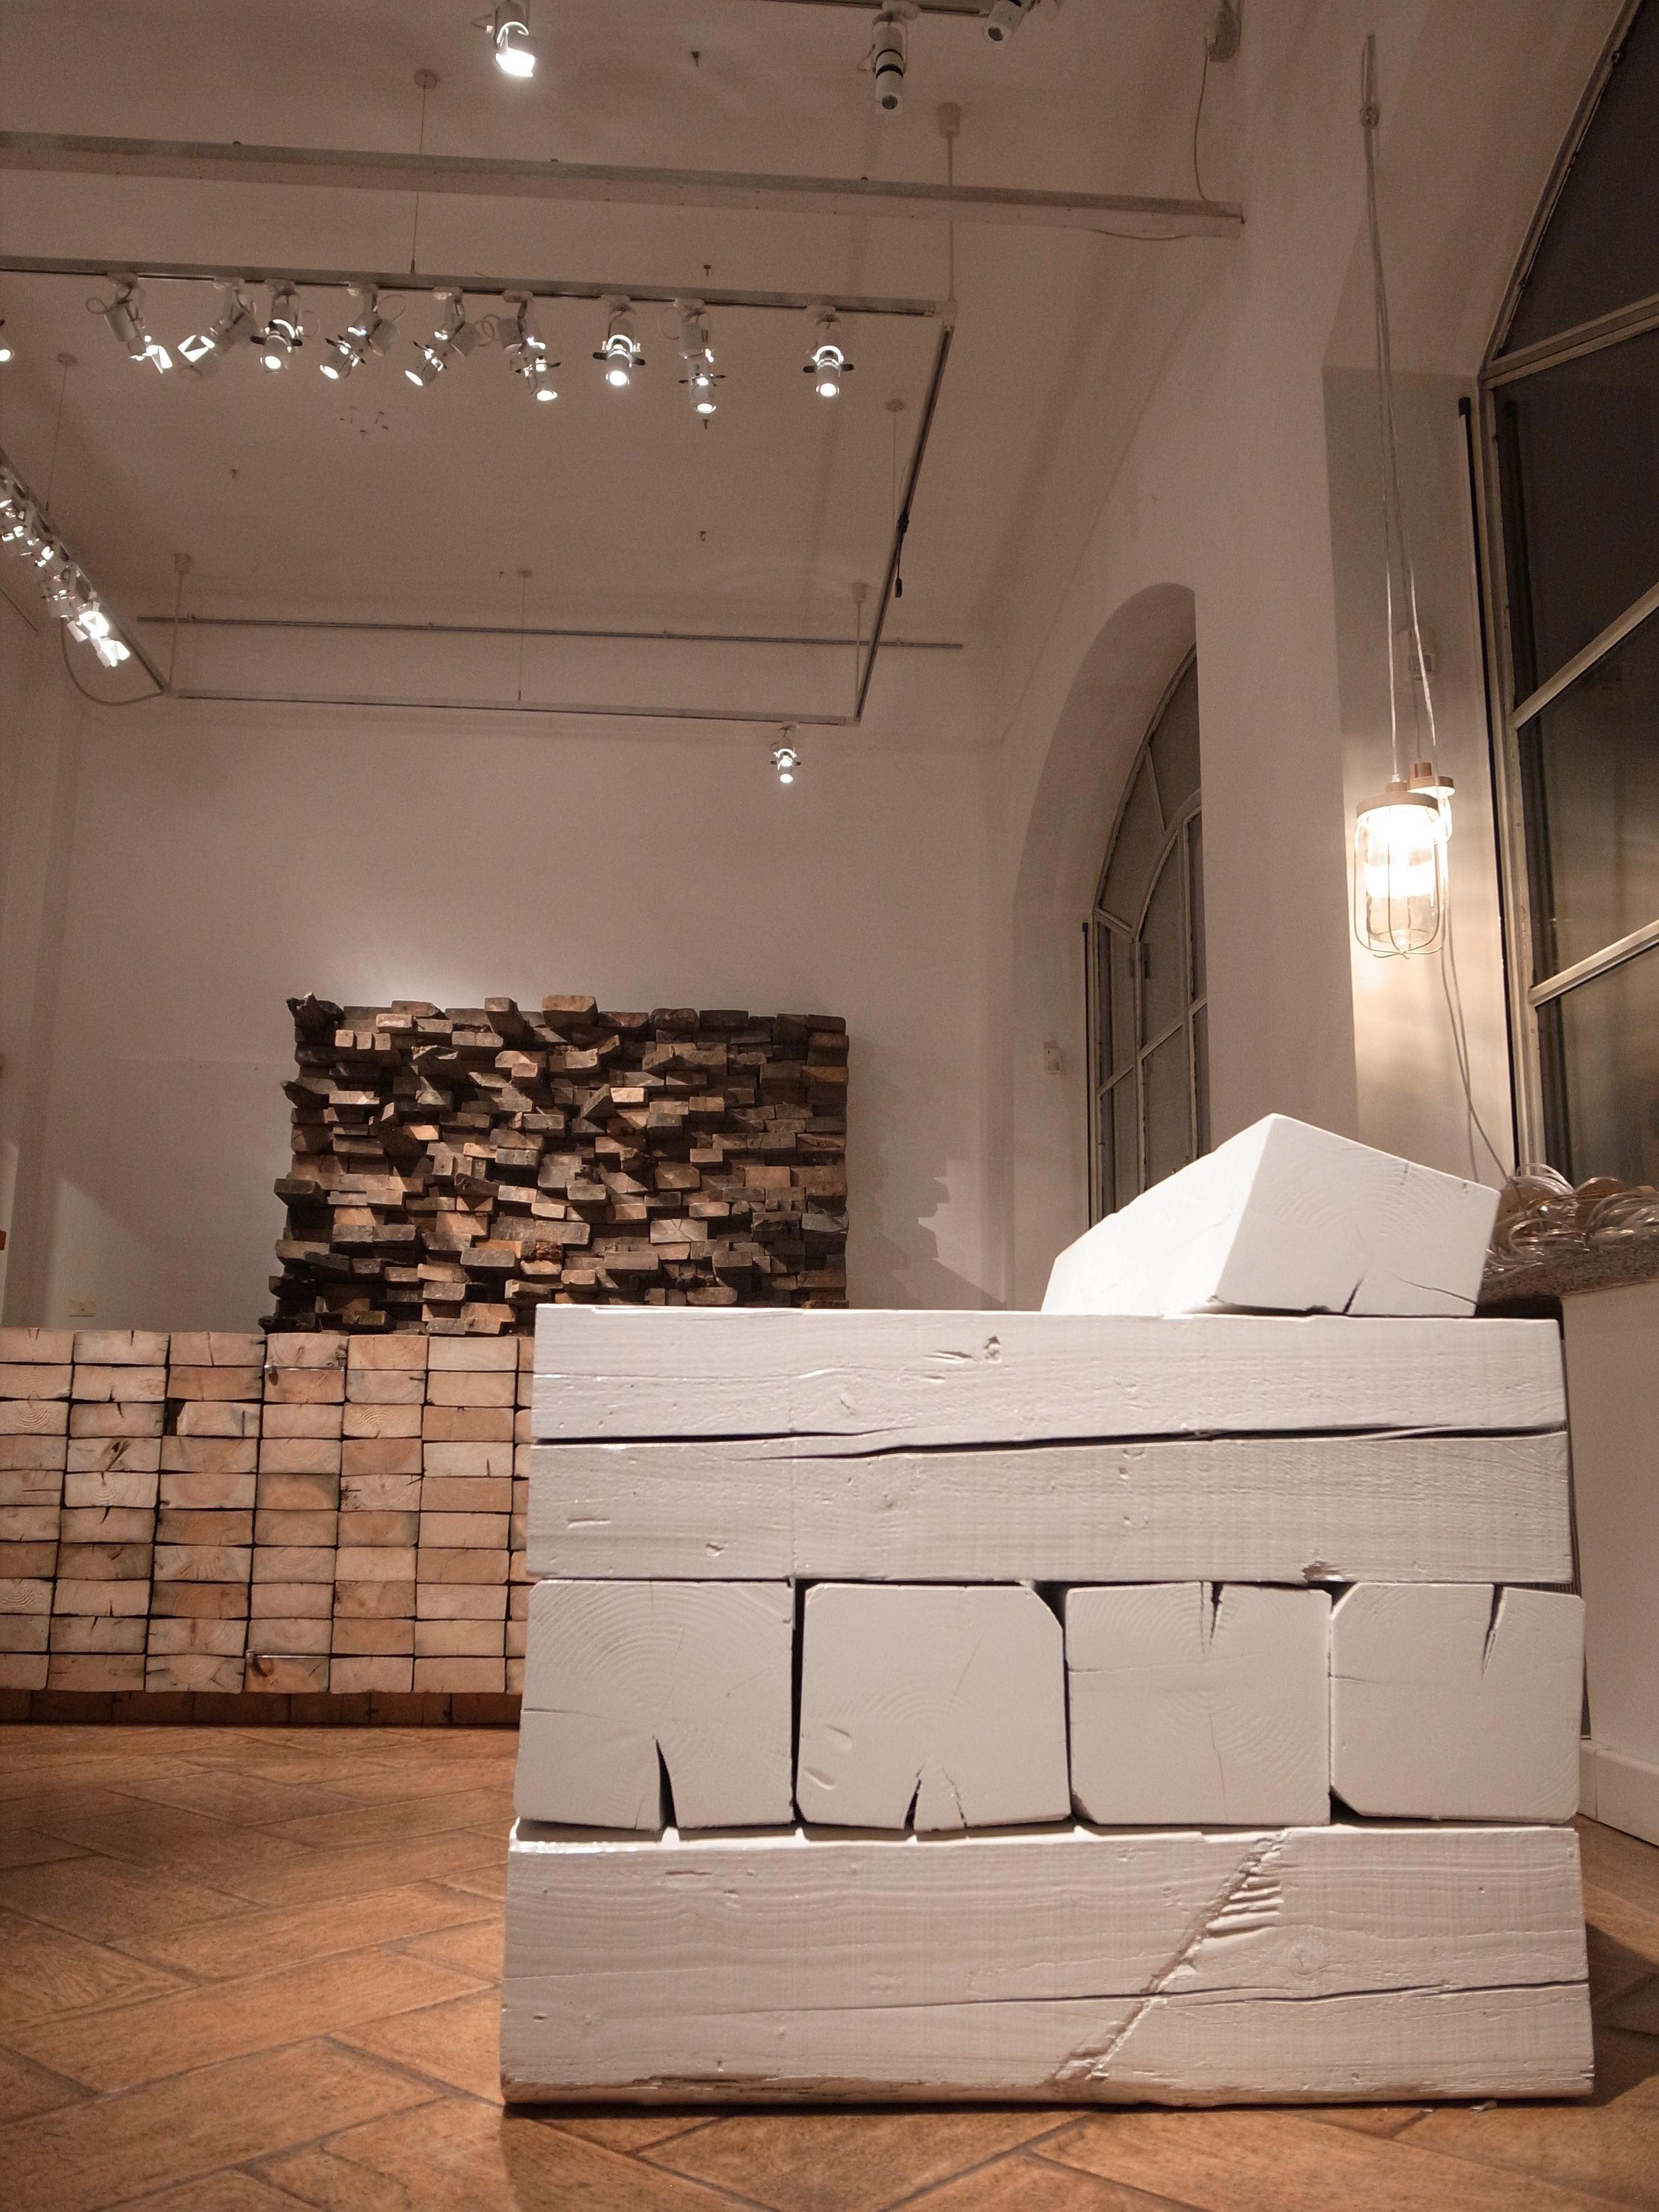 Our new BEAM collection @ SPAZIO ROSSANA ORLANDI